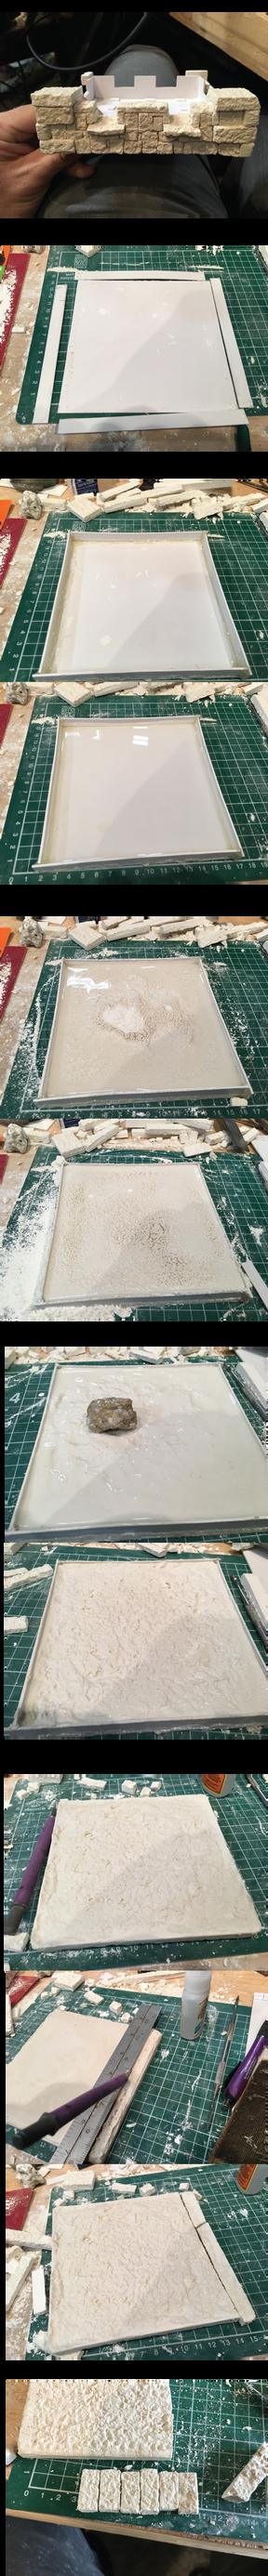 Tutorial on making Plaster of Paris Blocks